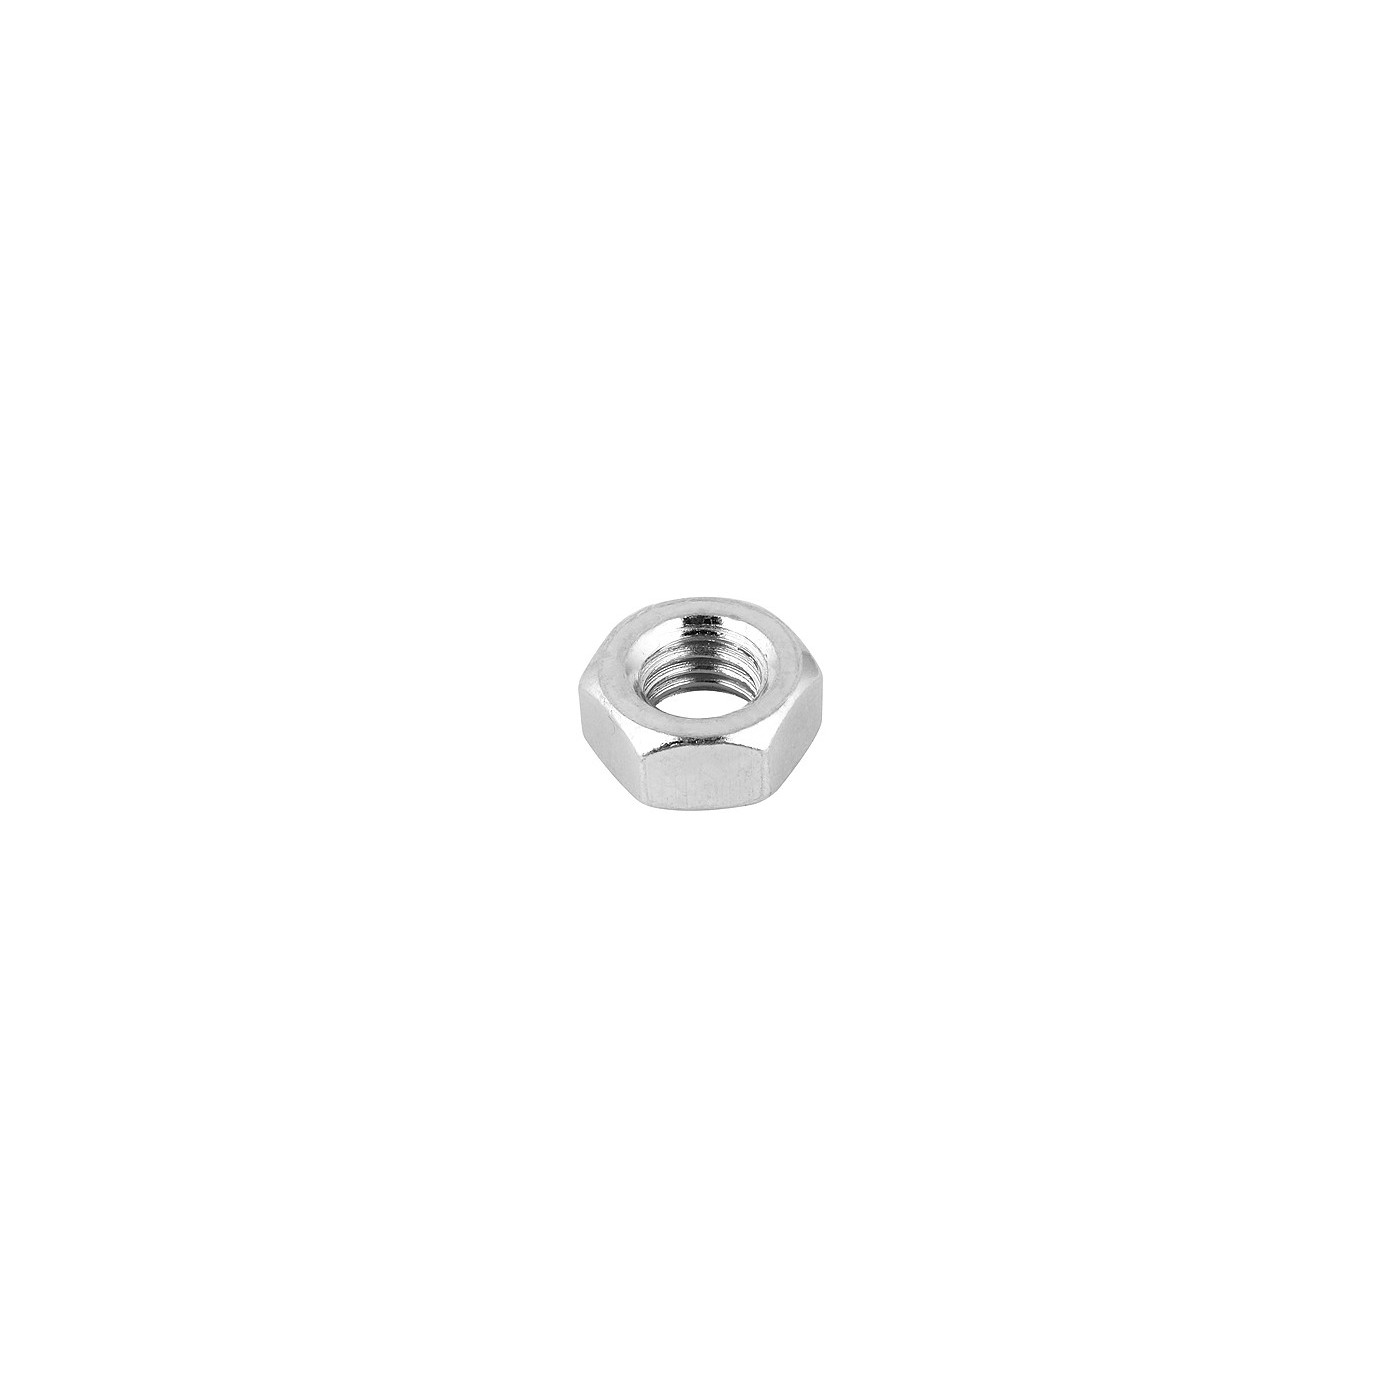 Set of 40 hexagon nuts (M4, galvanized steel, DIN 934)